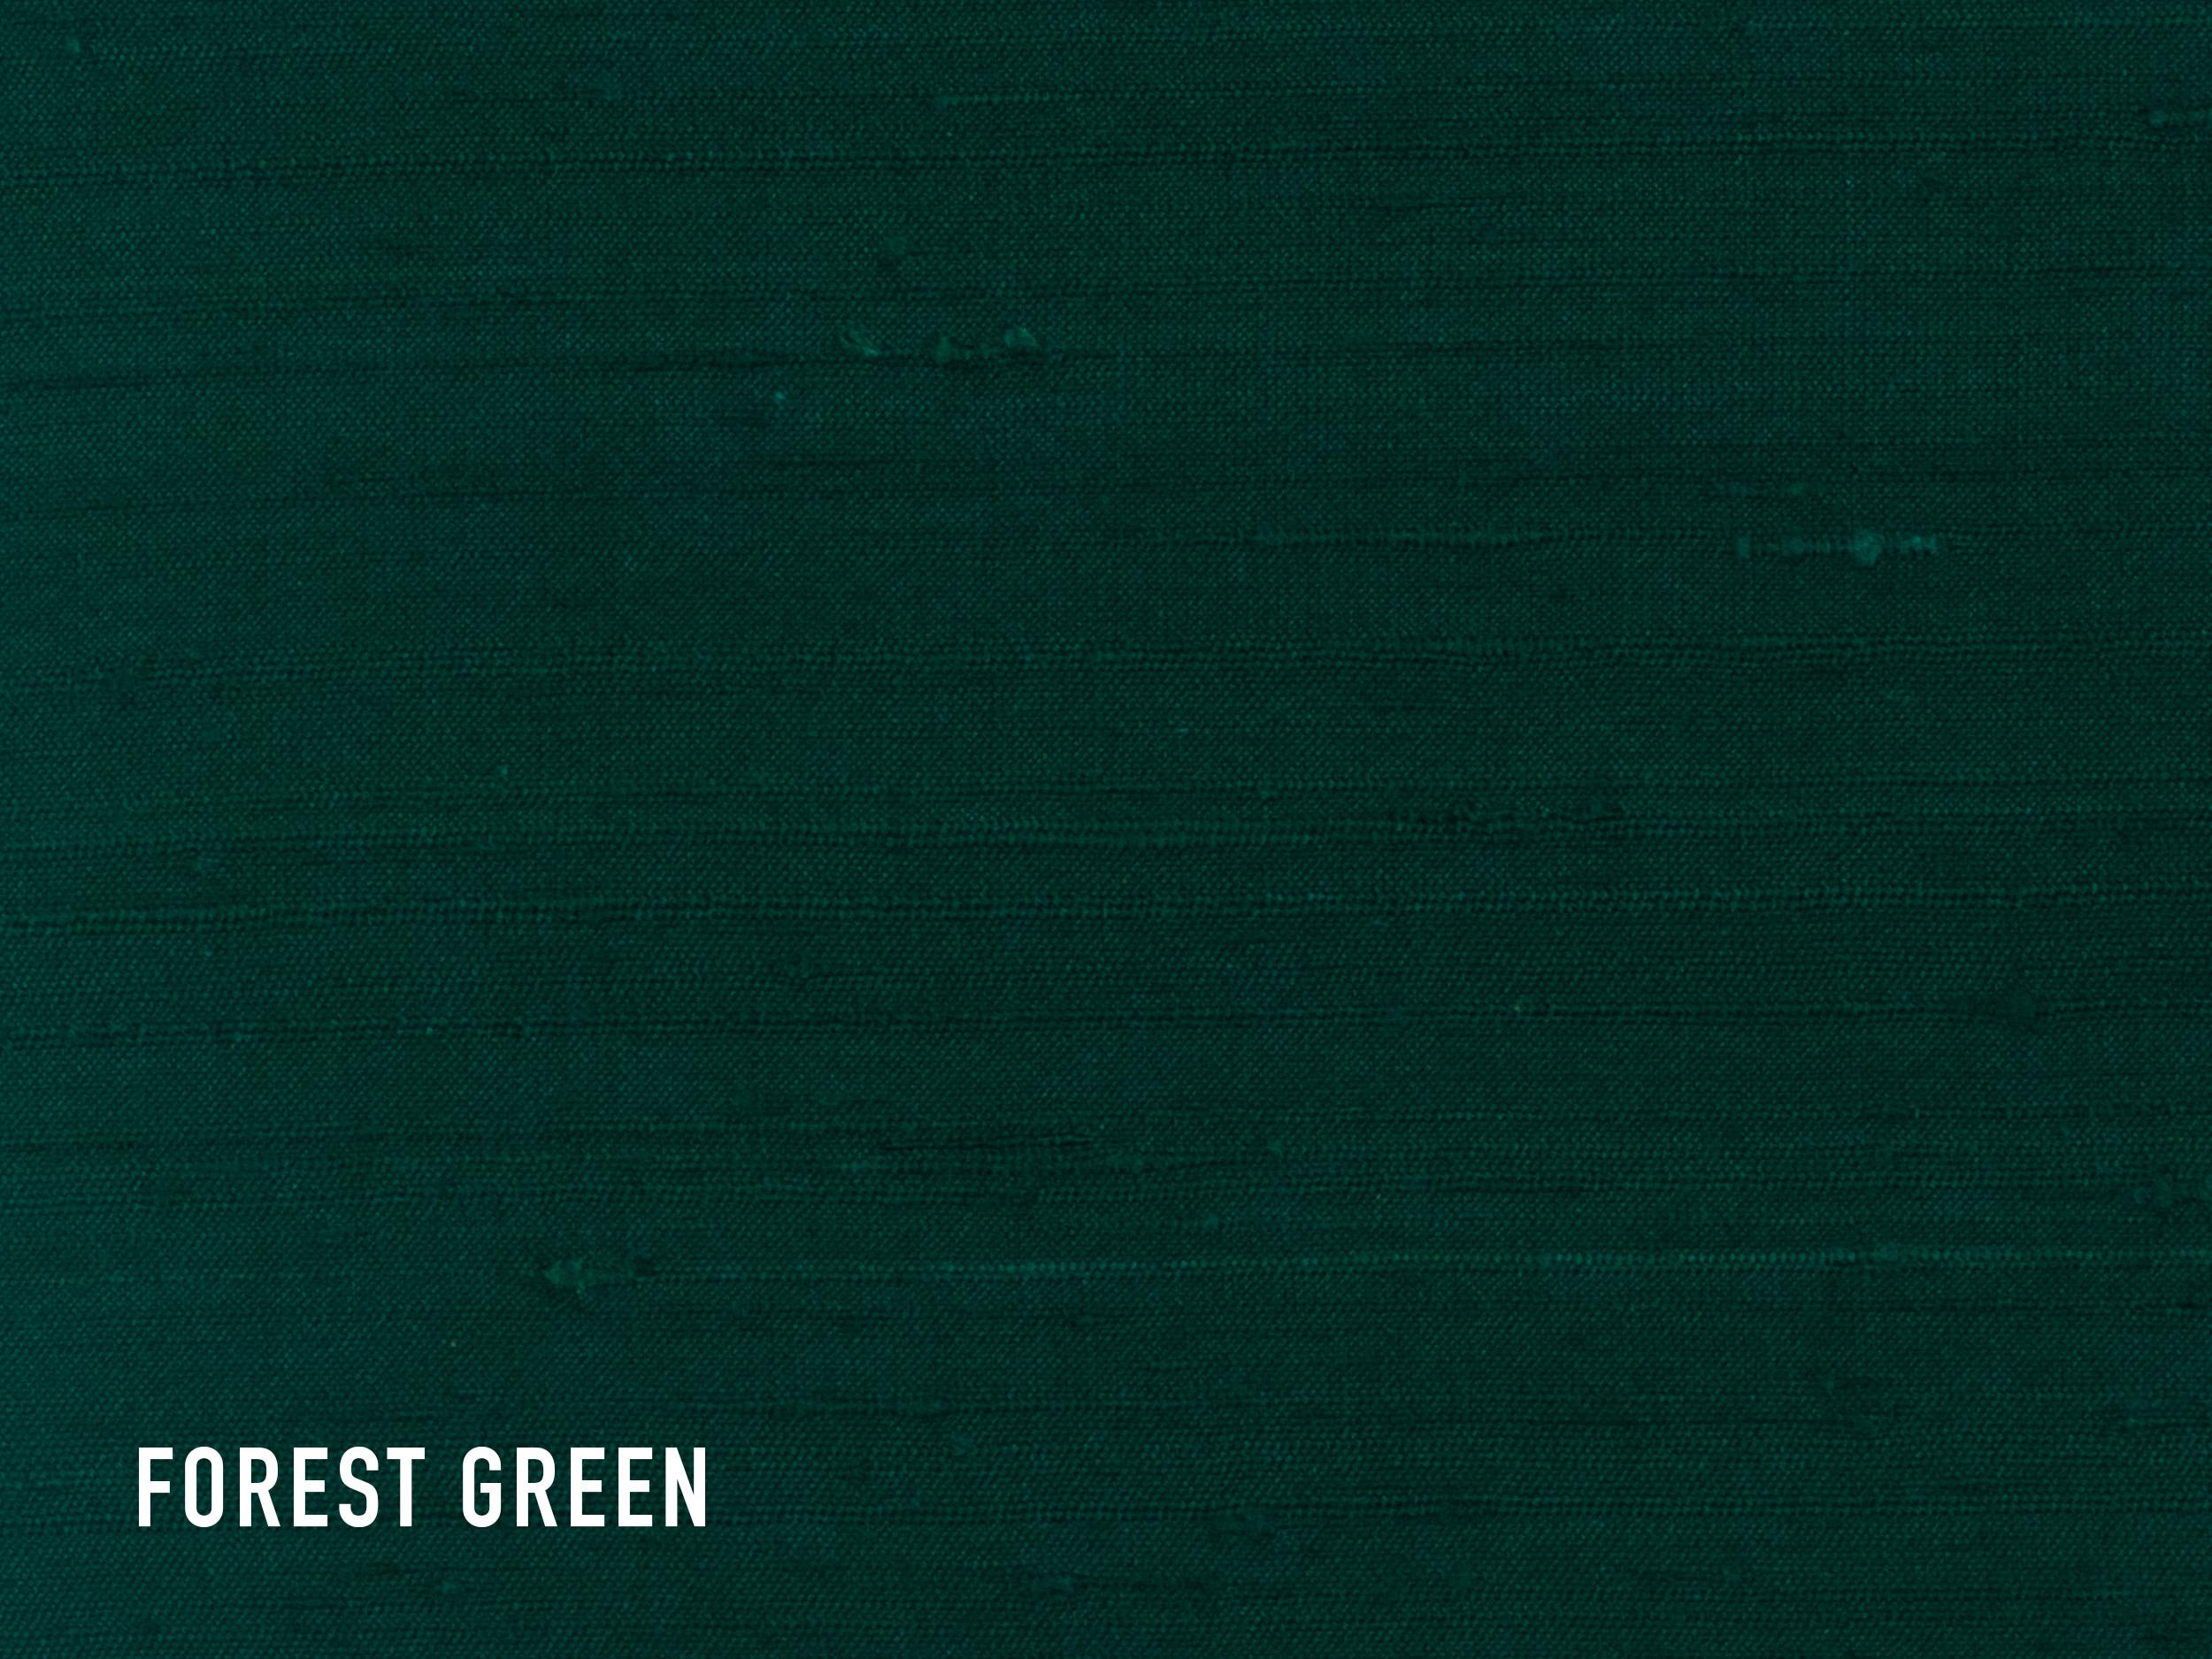 forest_green.jpg